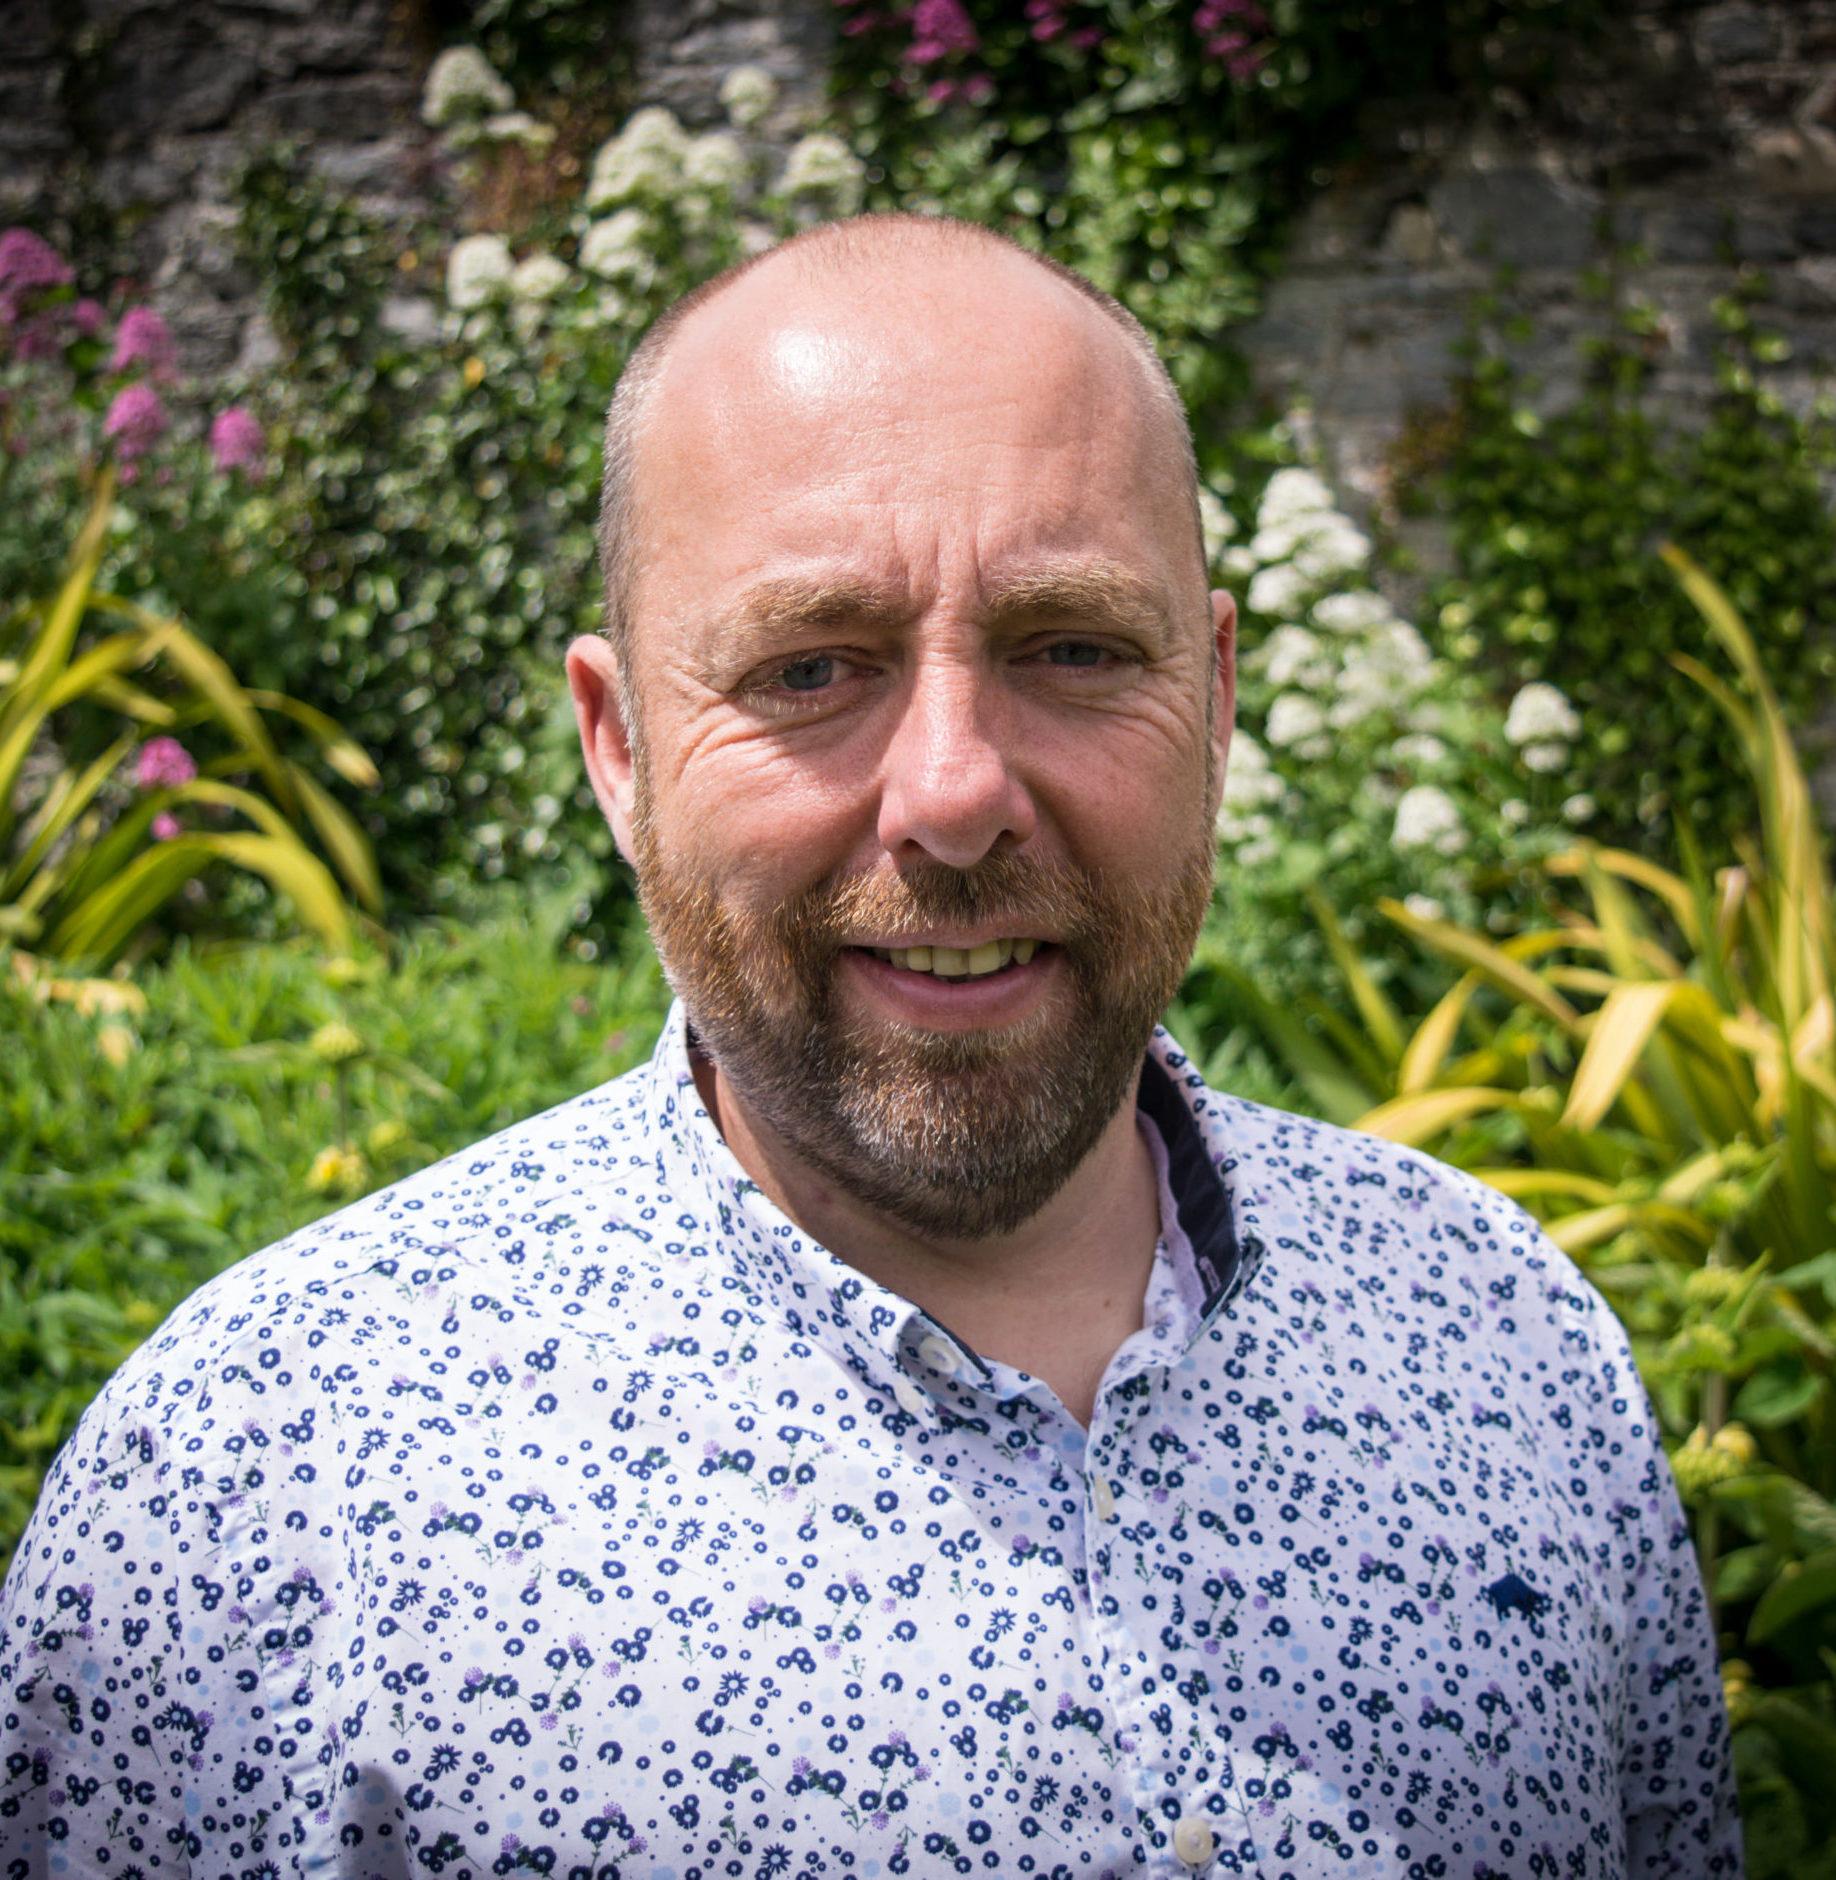 Ian Pitchford